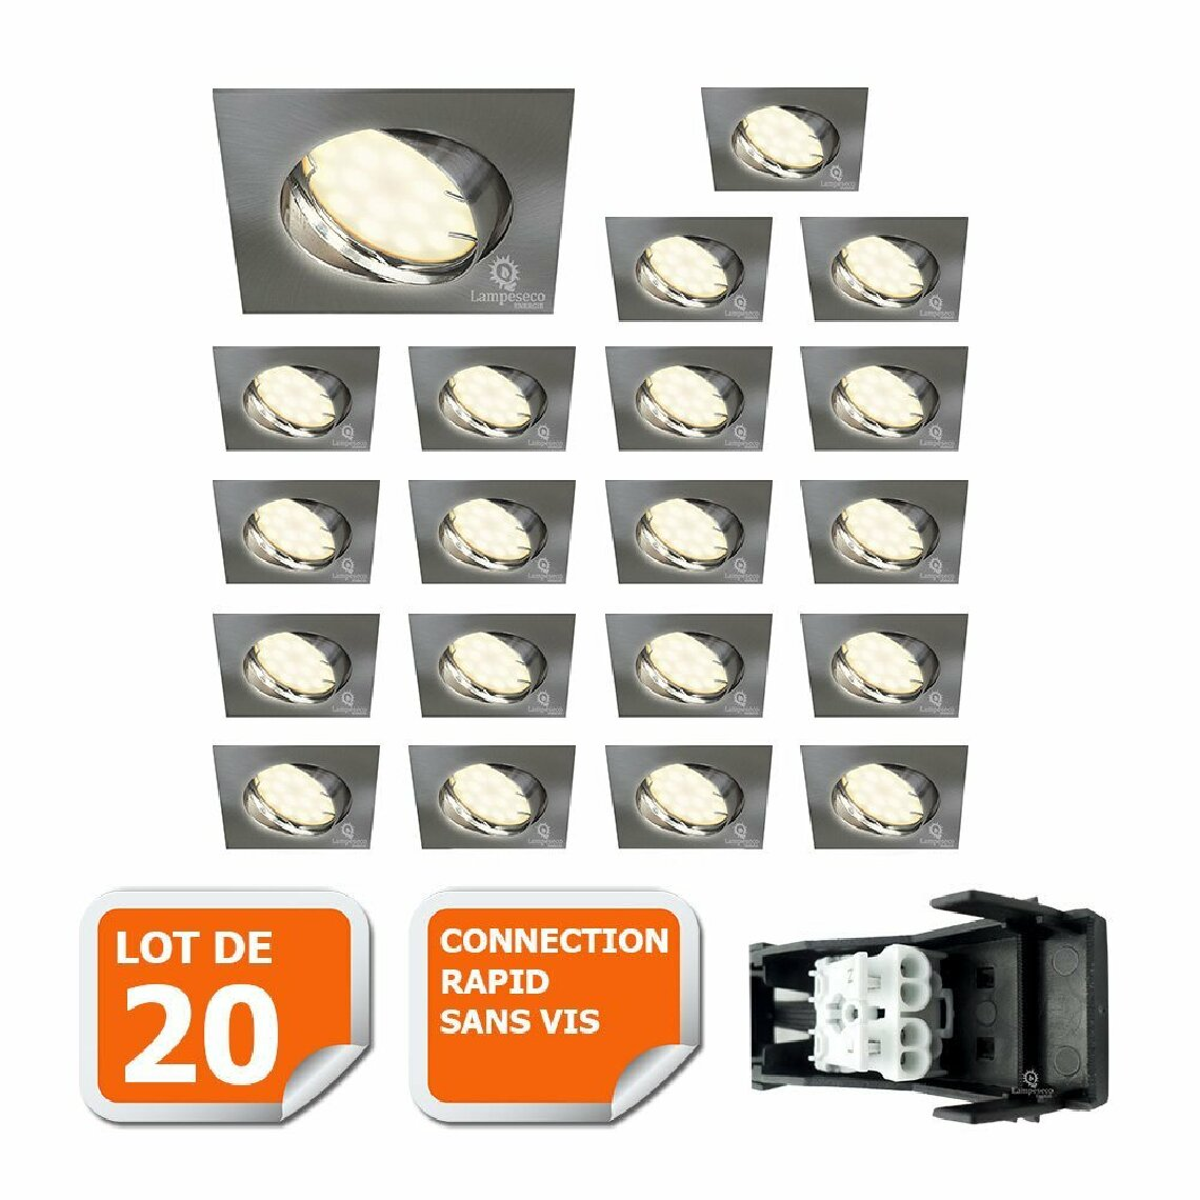 Eurobryte LOT DE 20 SPOT ENCASTRABLE ORIENTABLE LED CARRE ALU BROSSE GU10 230V eq. 50W BLANC CHAUD